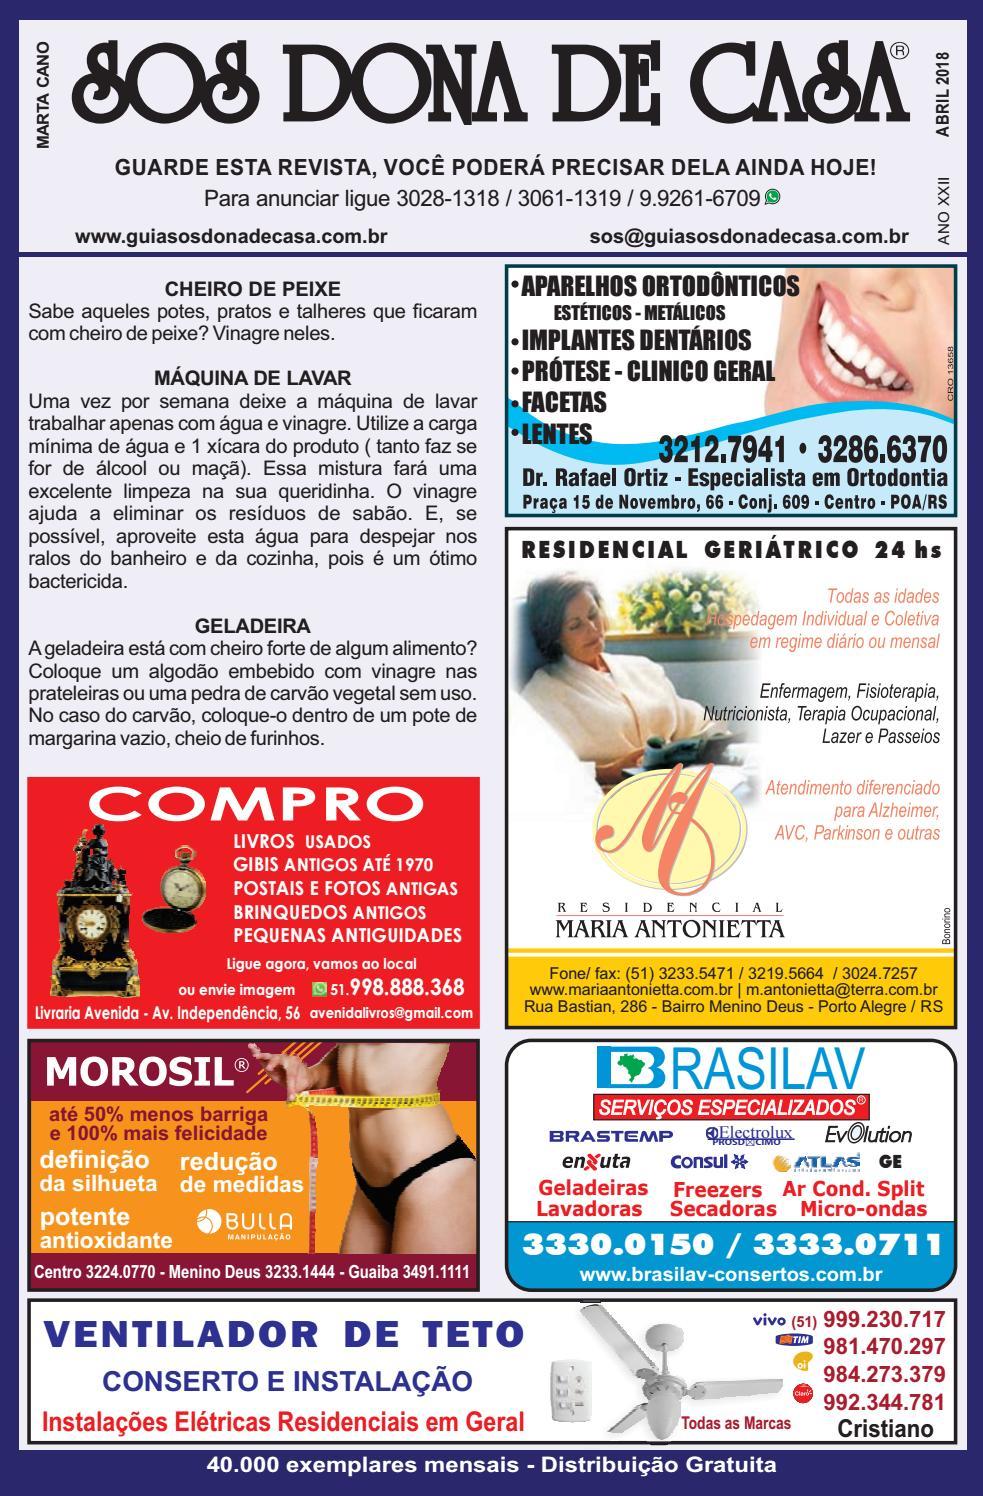 Centro de próstata especializado de Milán